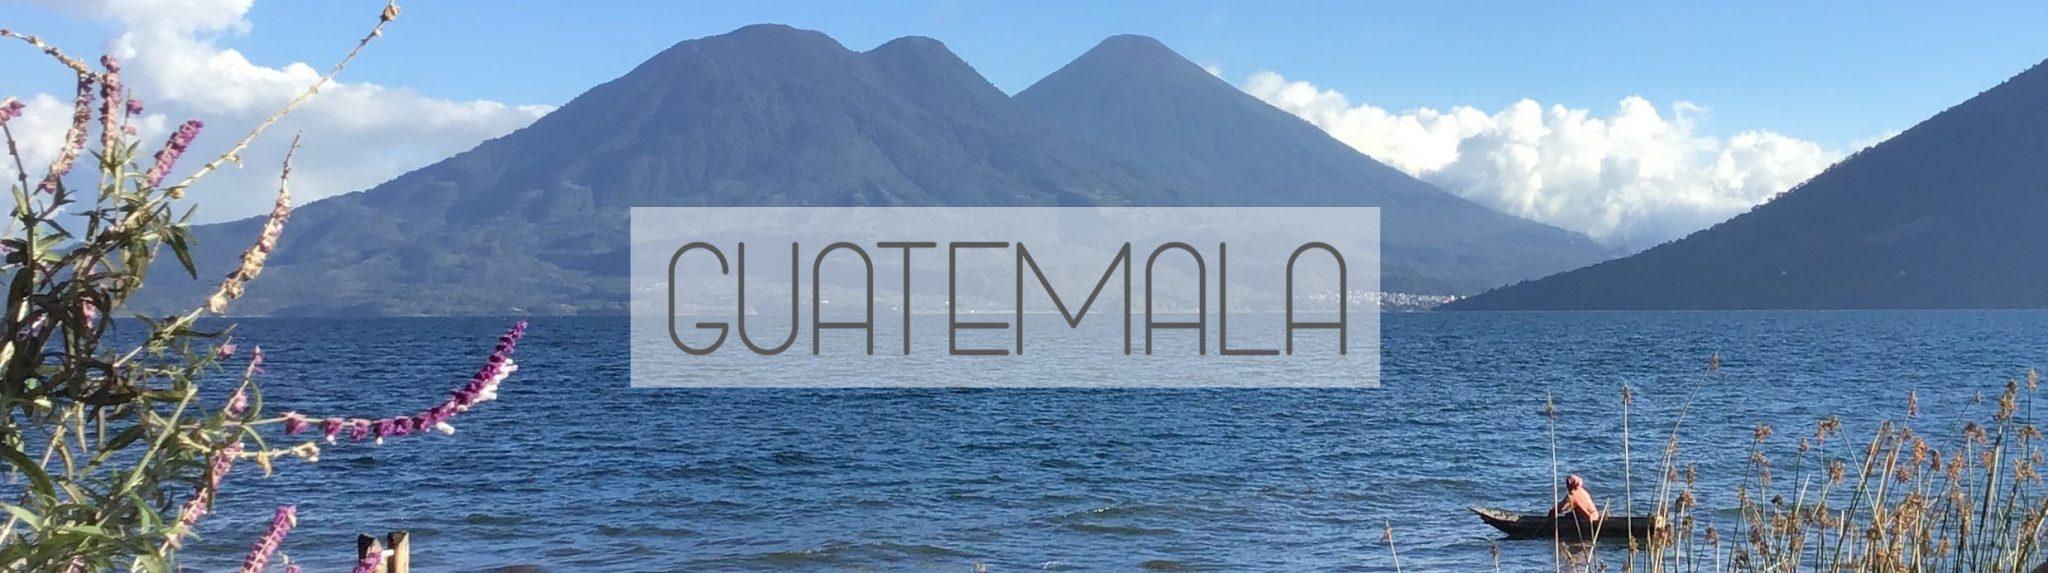 Guatemala reisinfo